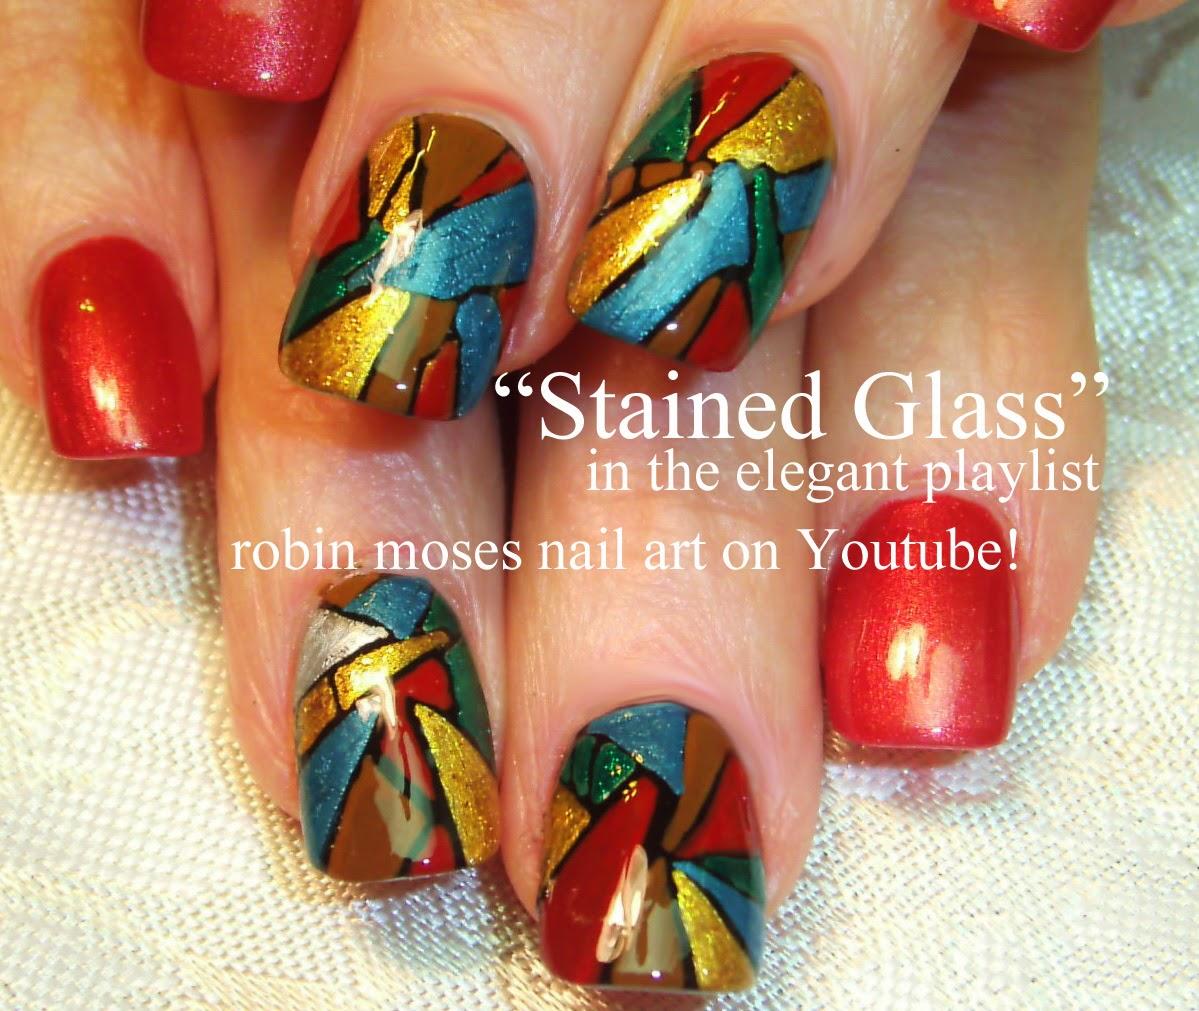 Robin moses nail art stained glass nails valentines day nail httpsyoutubeuserrobinmosesnailart nail art design ideas prinsesfo Choice Image